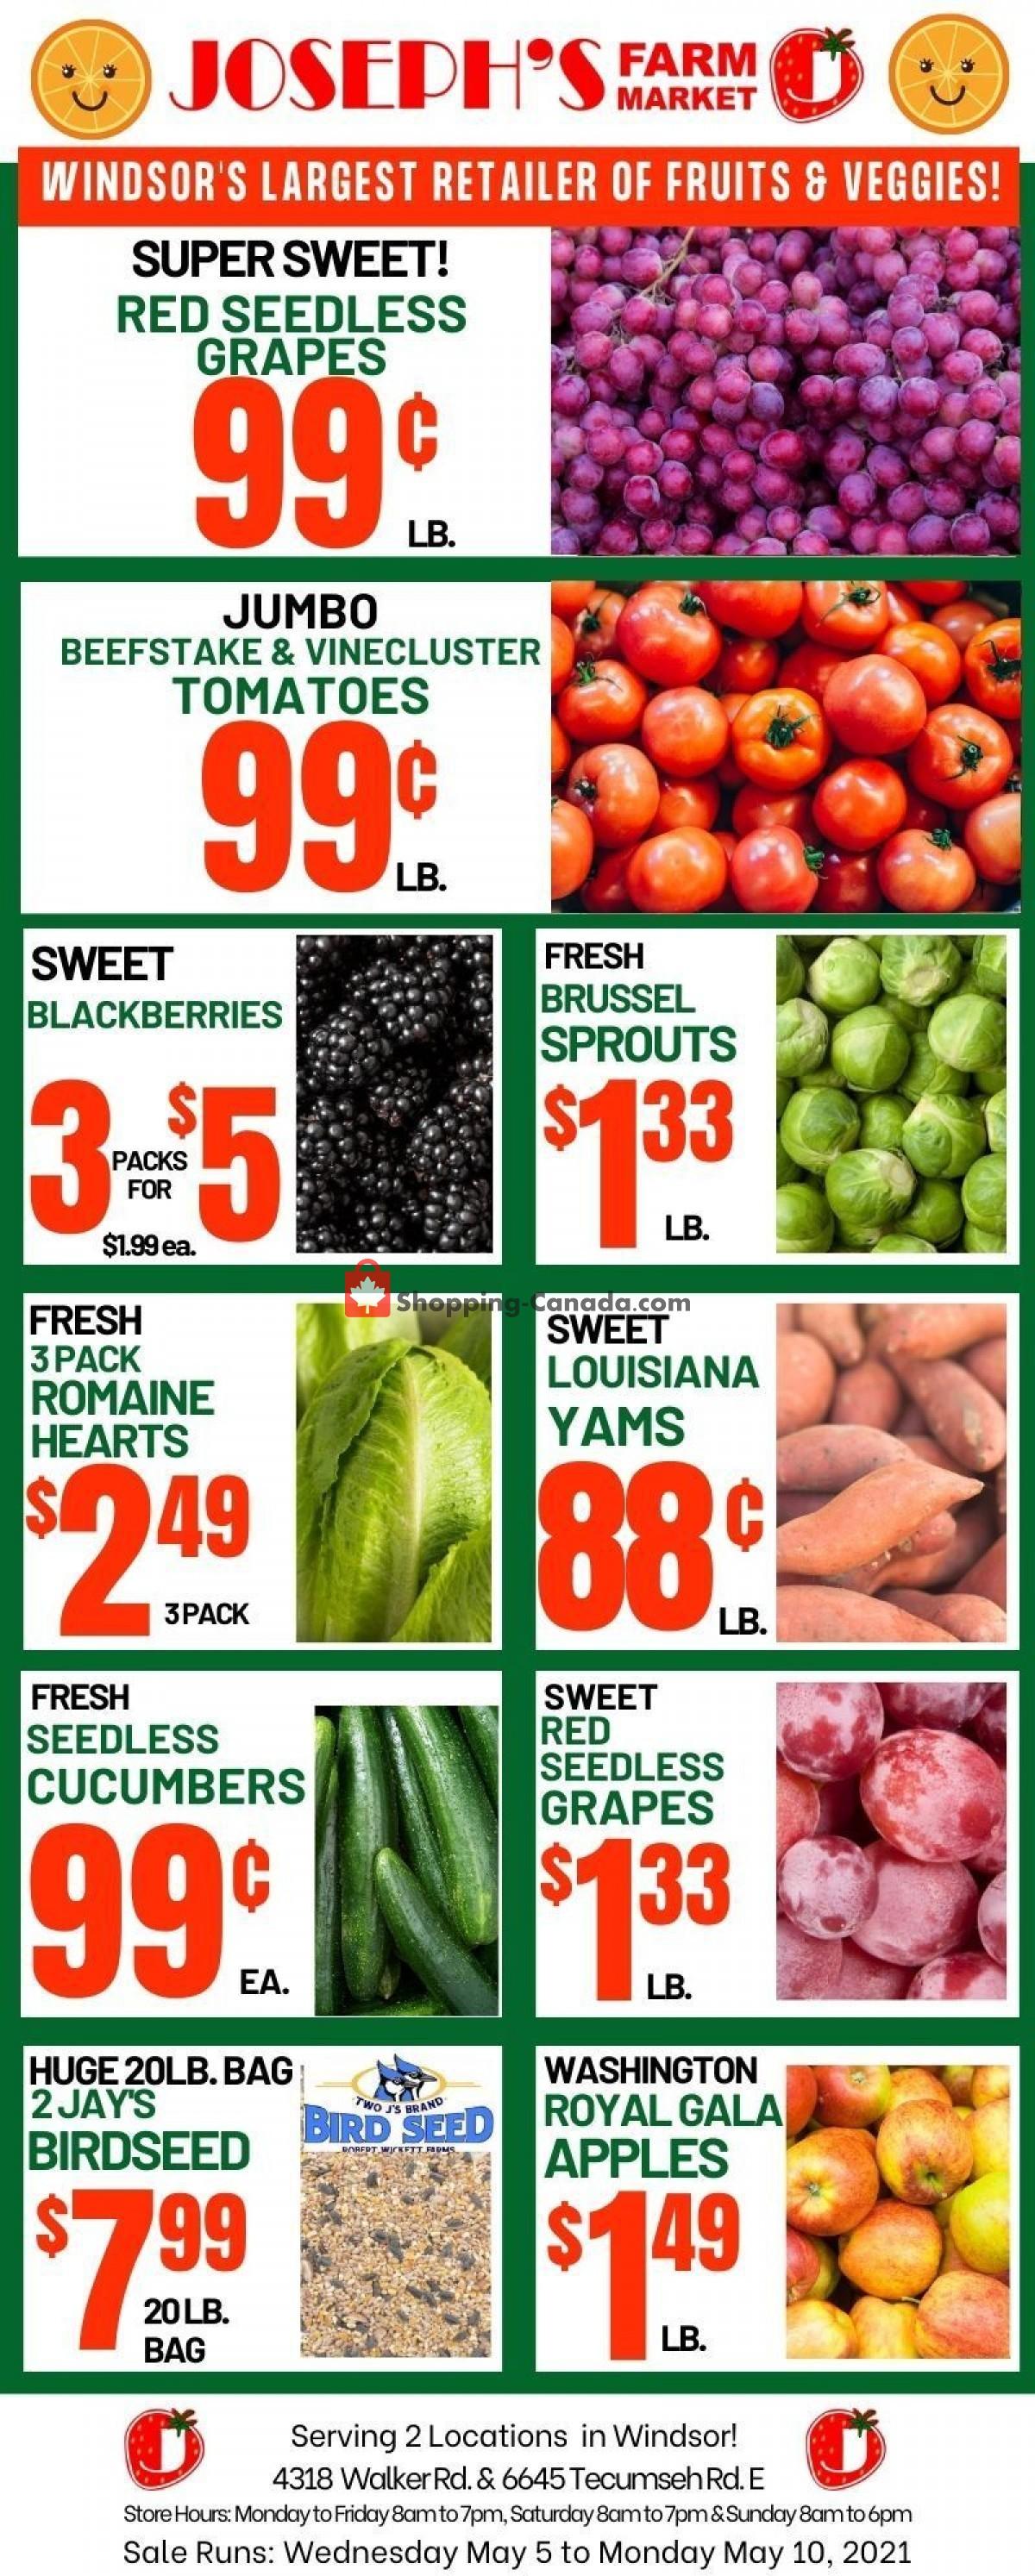 Flyer Joseph's Farm Market Canada - from Wednesday May 5, 2021 to Monday May 10, 2021